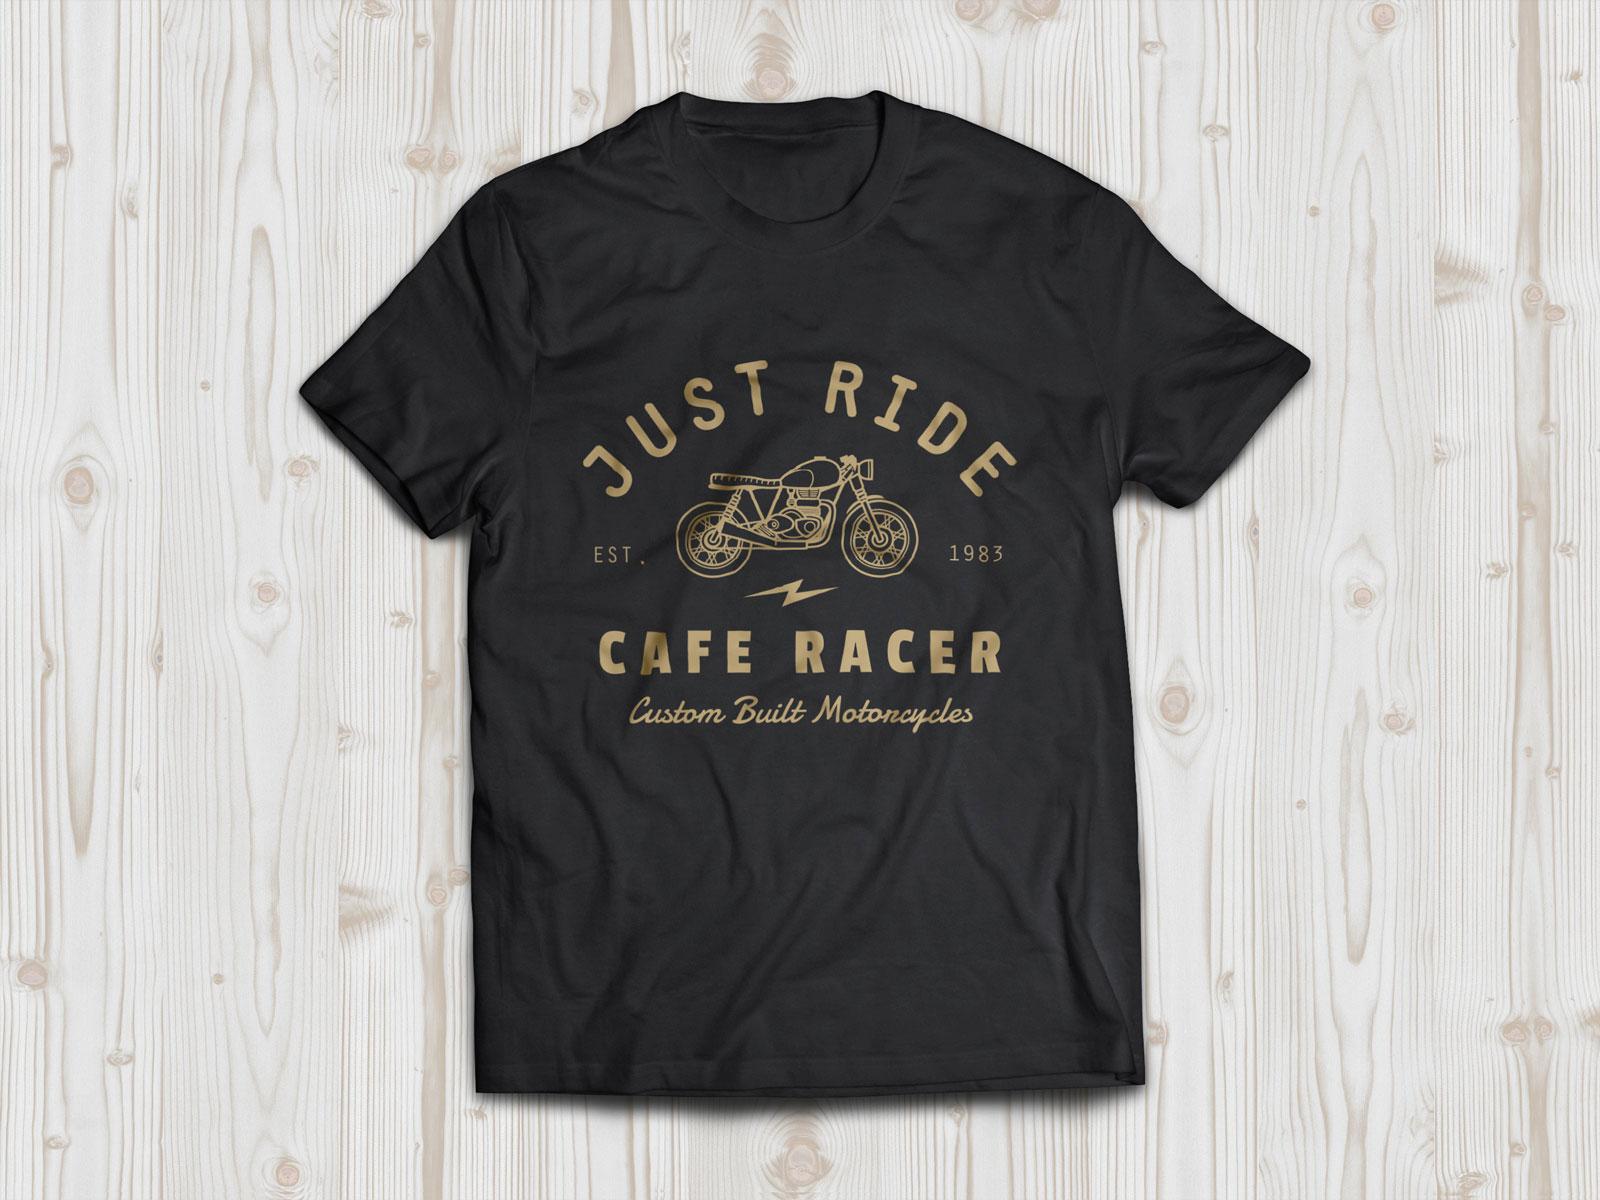 Free-Black-Half-Sleeves-T-shirt-Mockup-PSD-Frontside